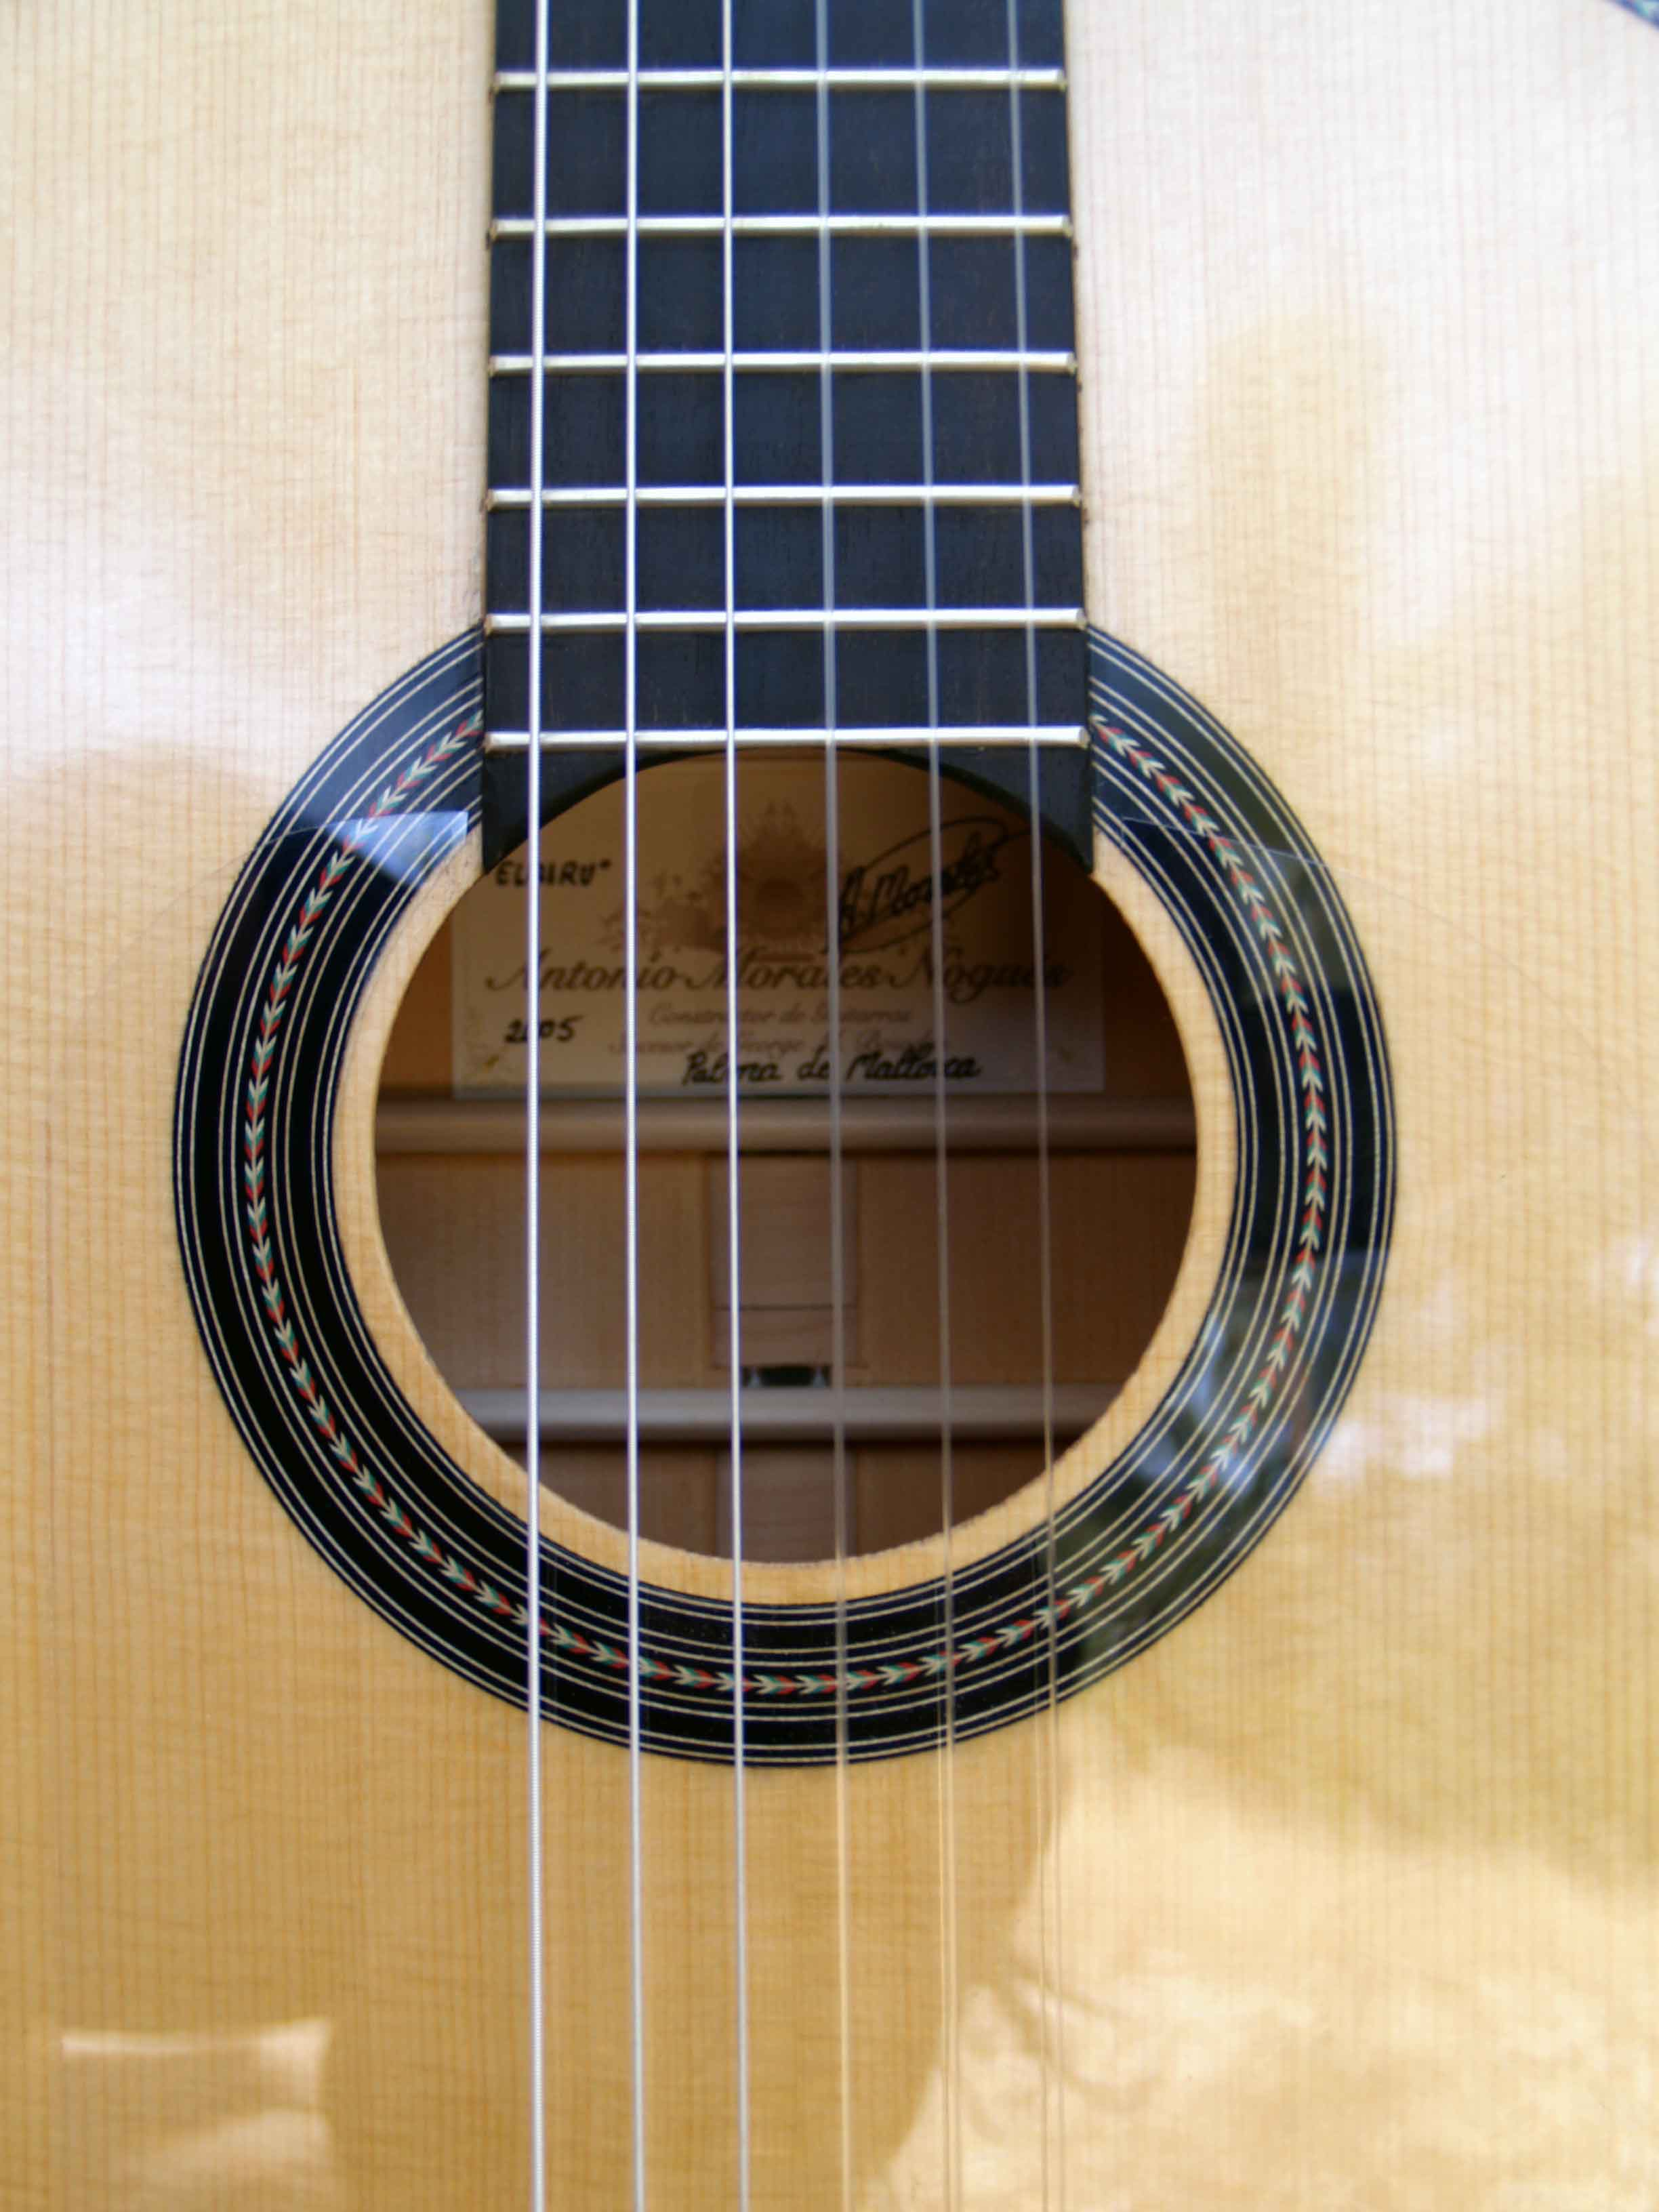 Flamenco guitar spikes rosette